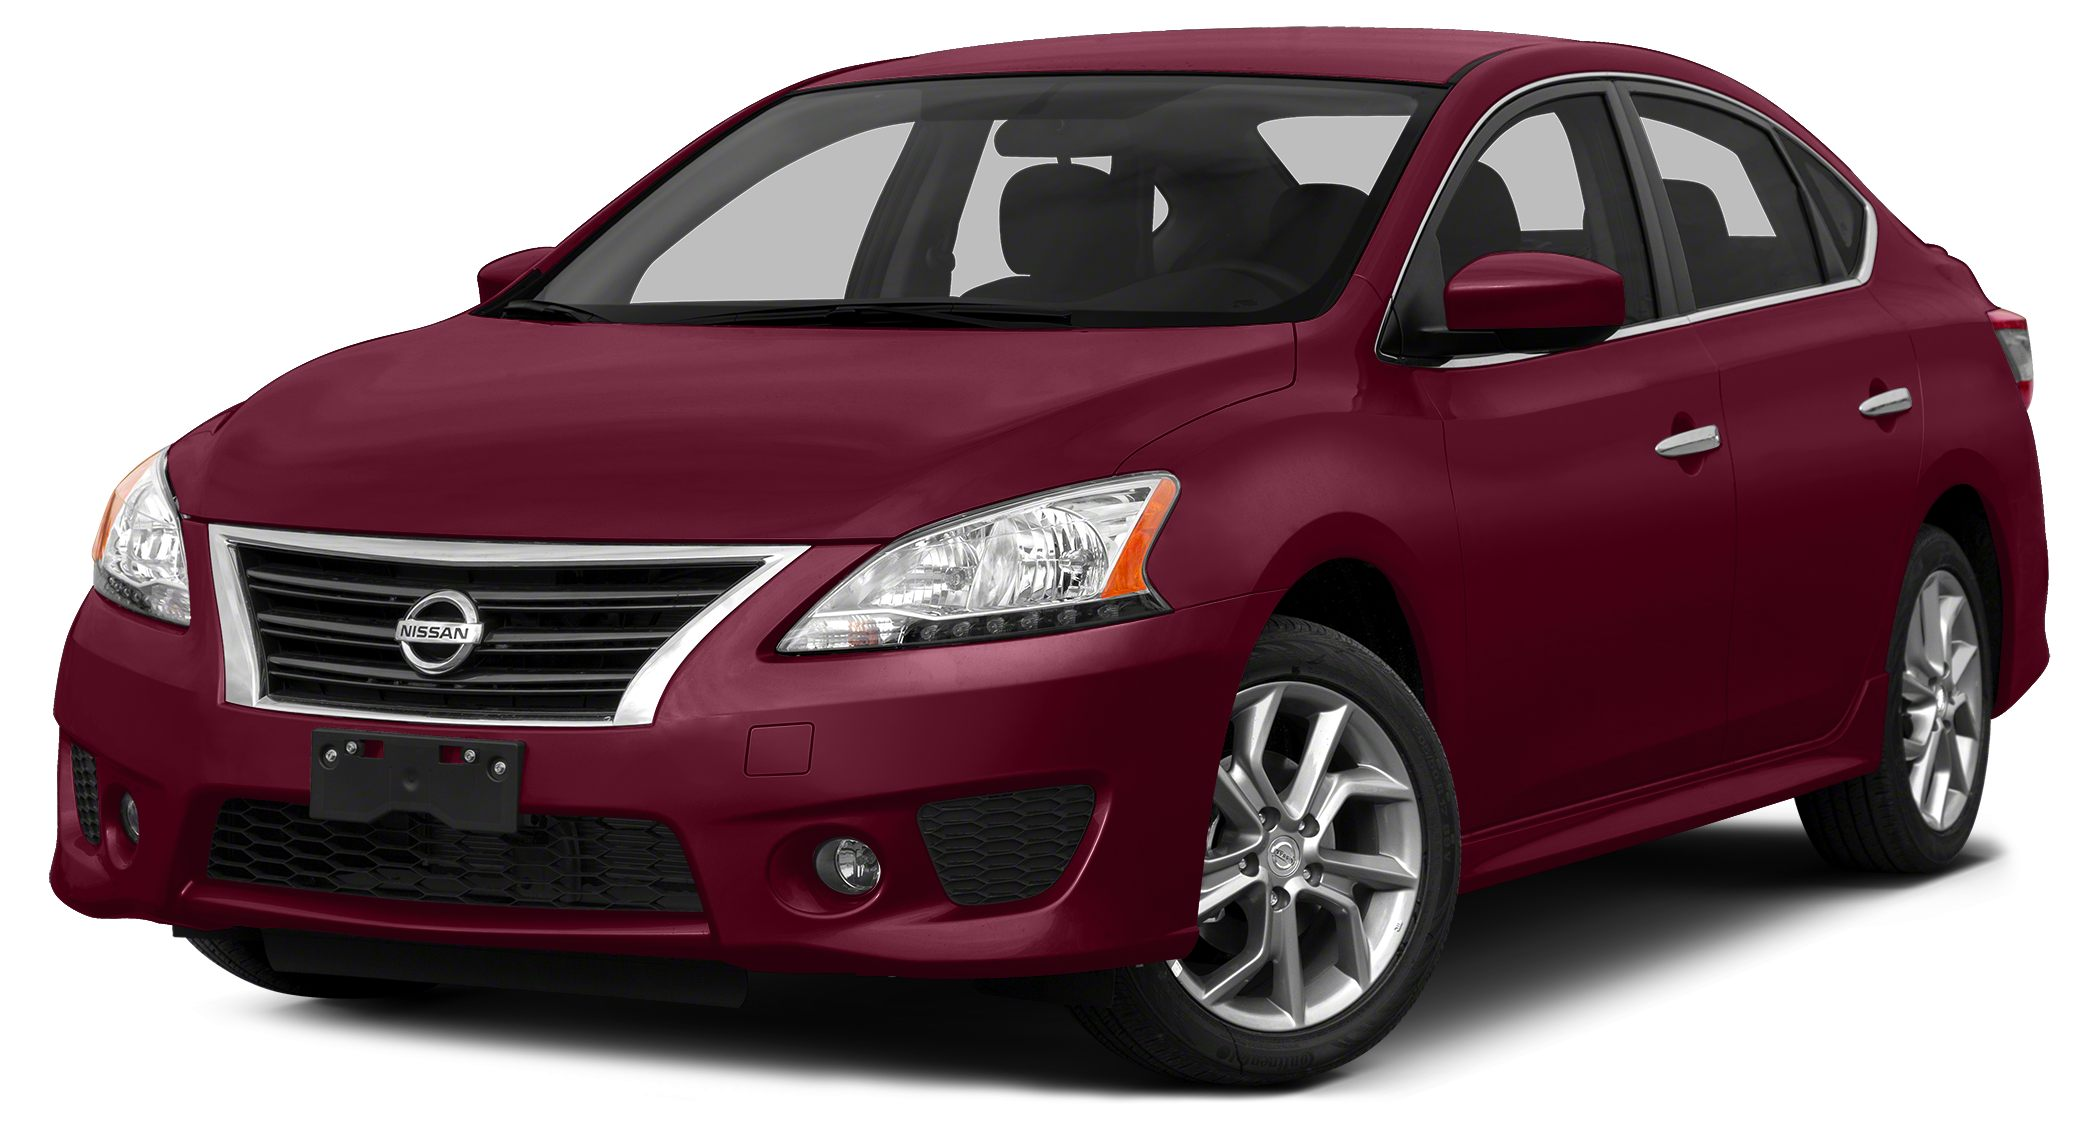 2014 Nissan Sentra SR Miles 9392Color Red Brick Stock 15P453A VIN 3N1AB7AP4EY266205